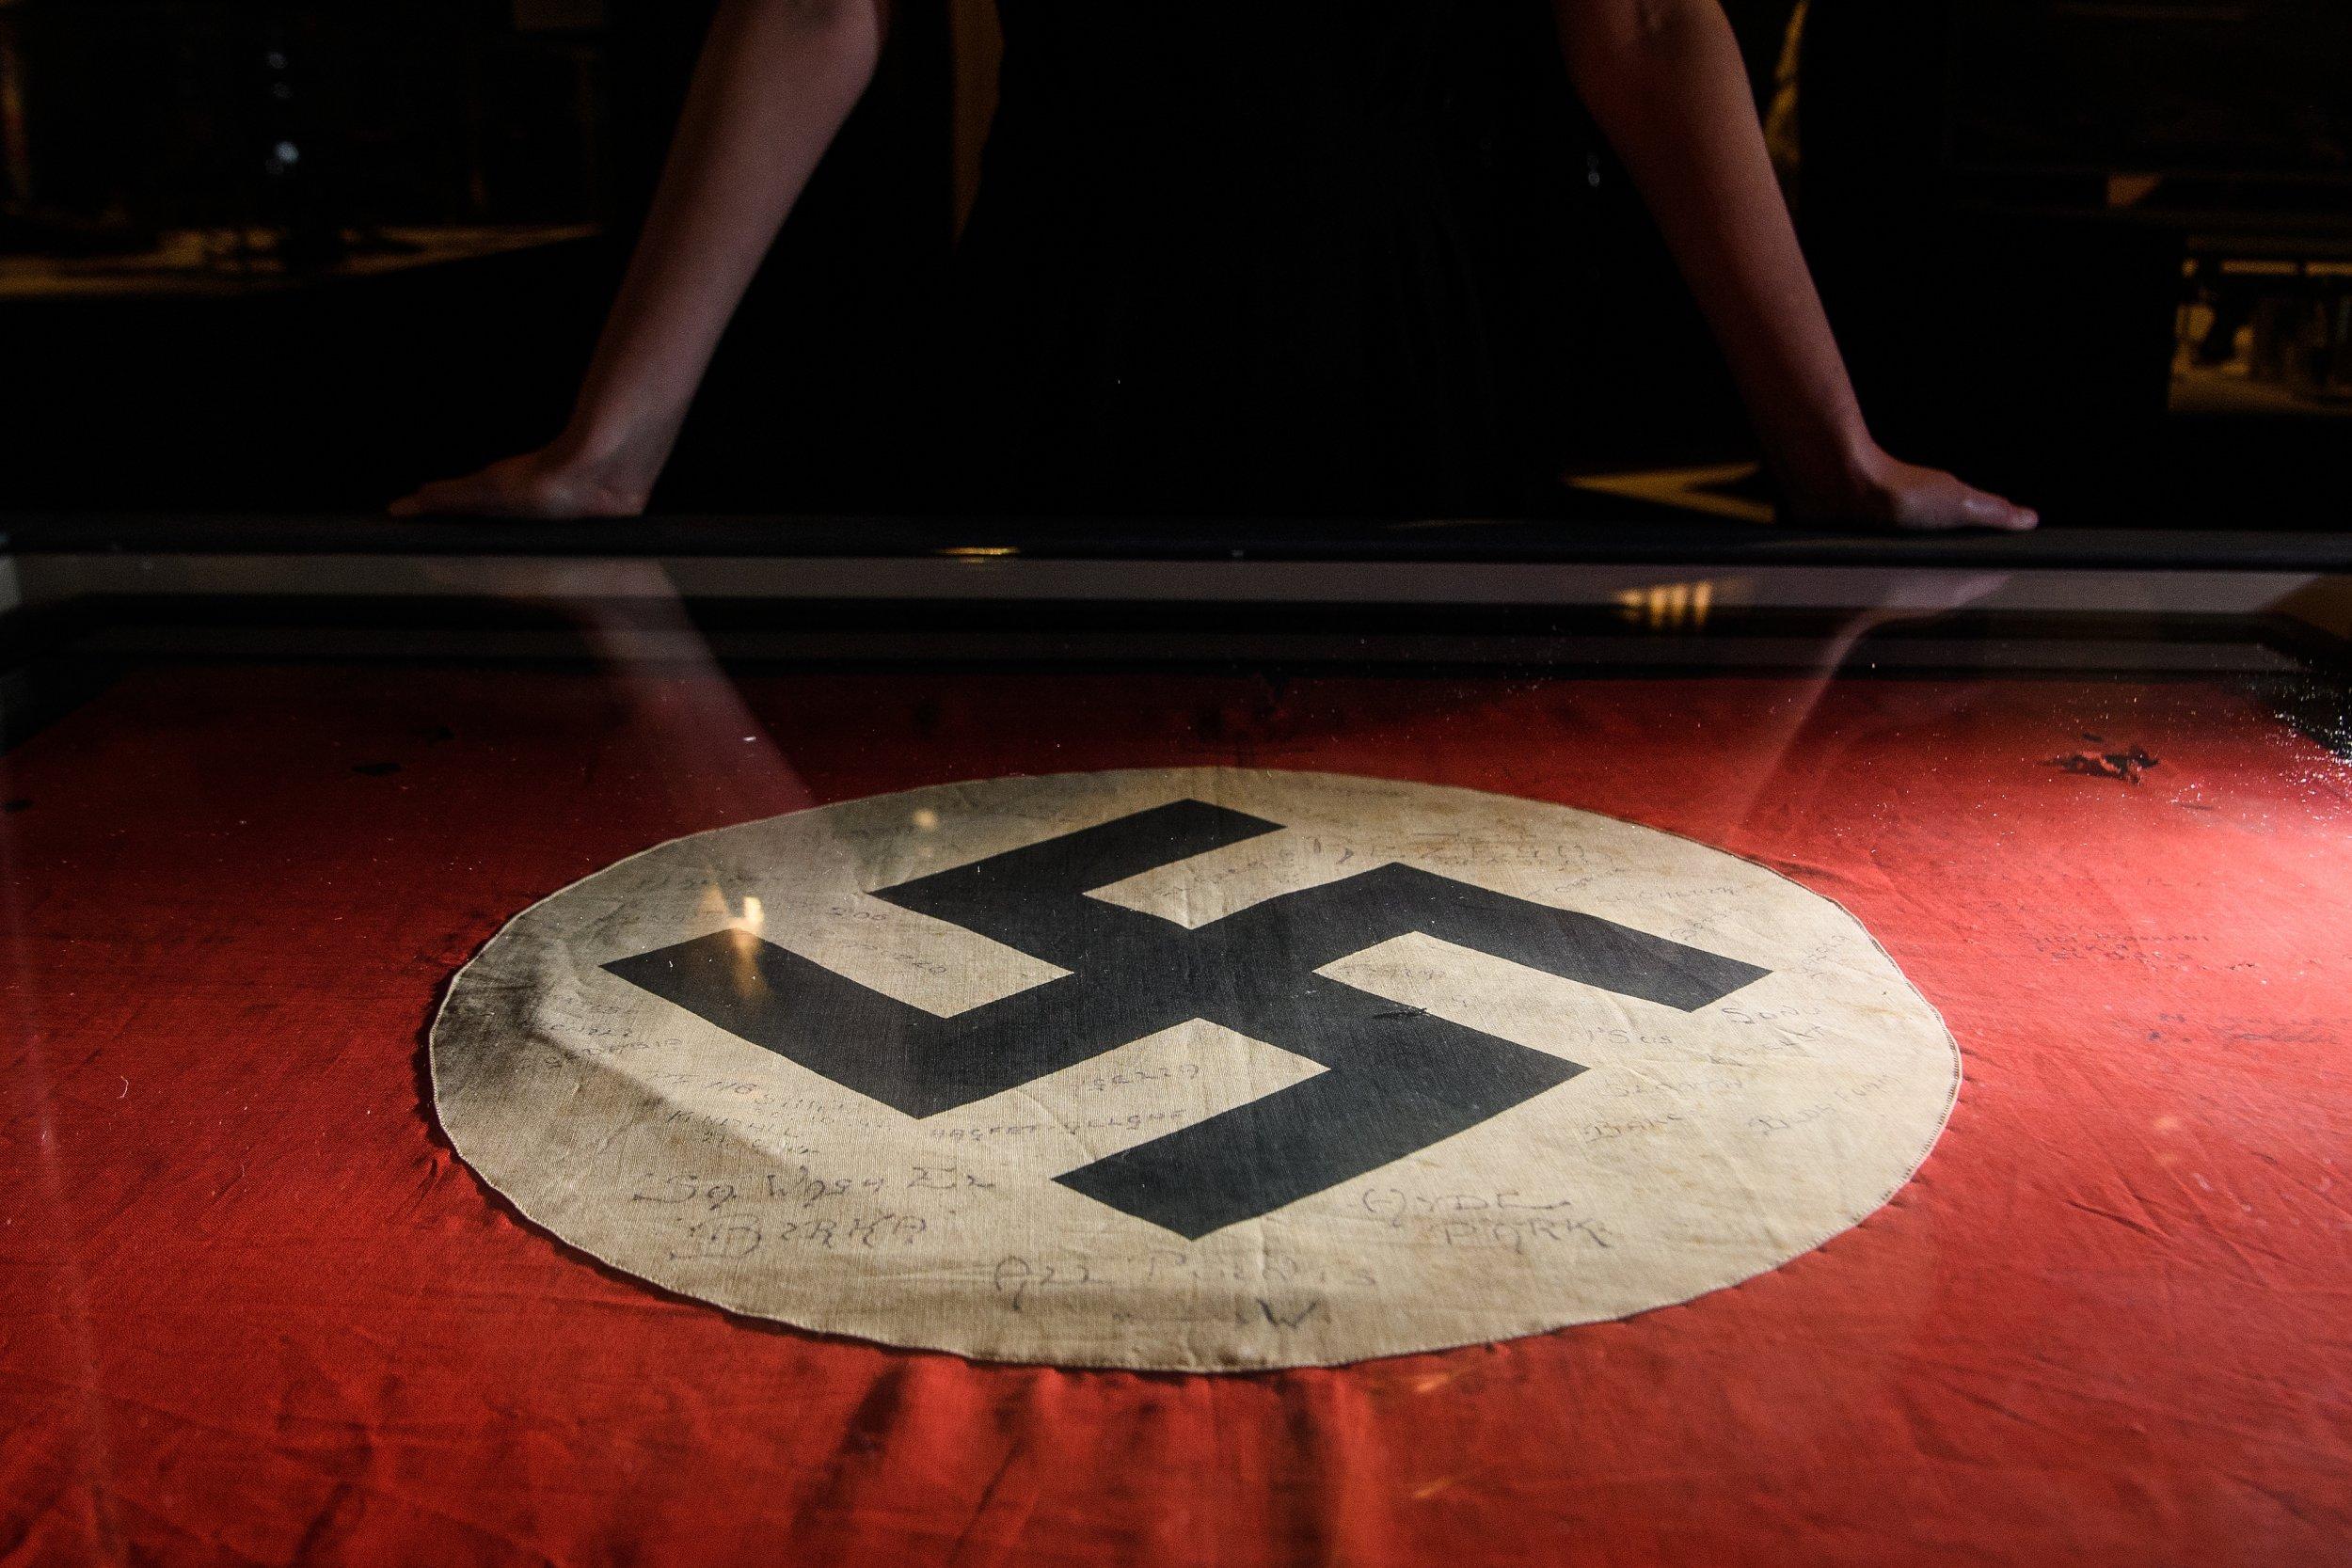 Nazi flag swastika North America Holocaust Hitler